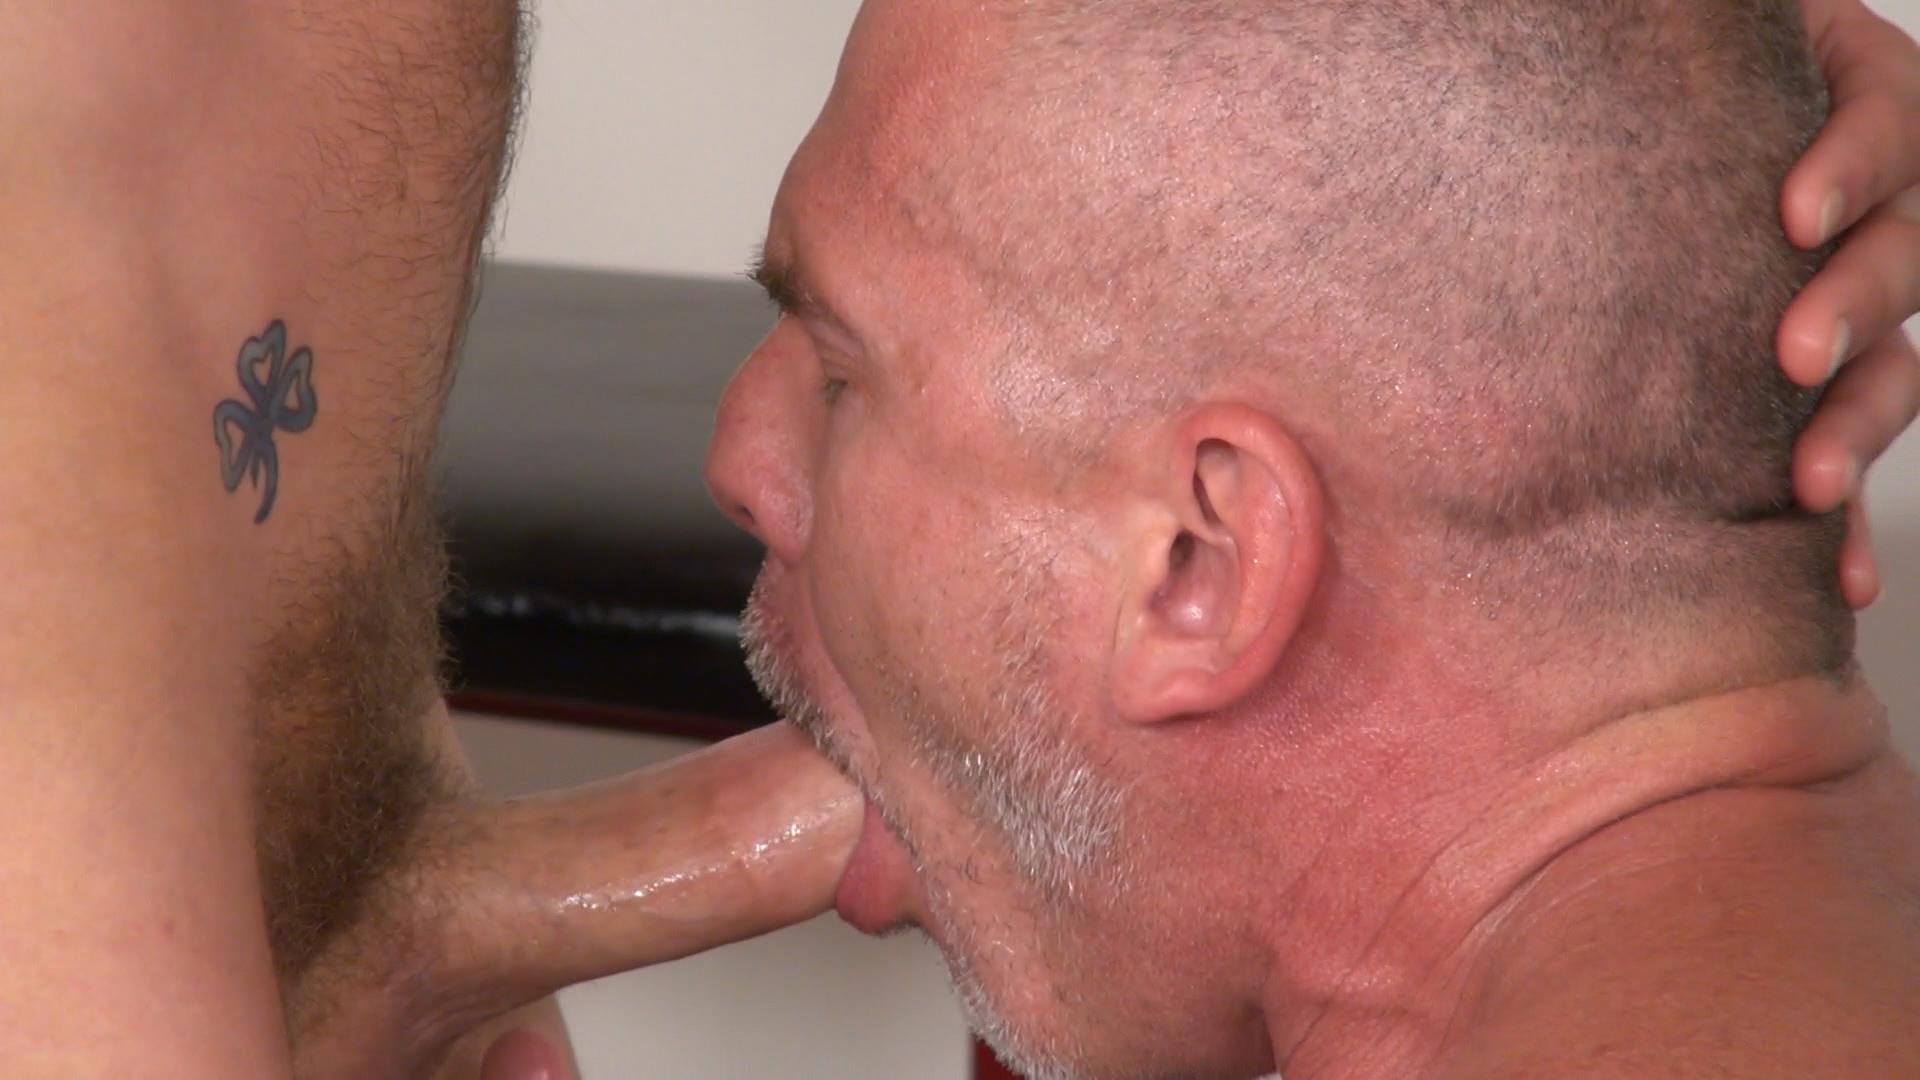 Raw-and-Rough-Sam-Dixon-and-Blue-Bailey-Daddy-And-Boy-Flip-Flip-Bareback-Fucking-Amateur-Gay-Porn-01 Blue Bailey Flip Flop Barebacking With A Hung Daddy